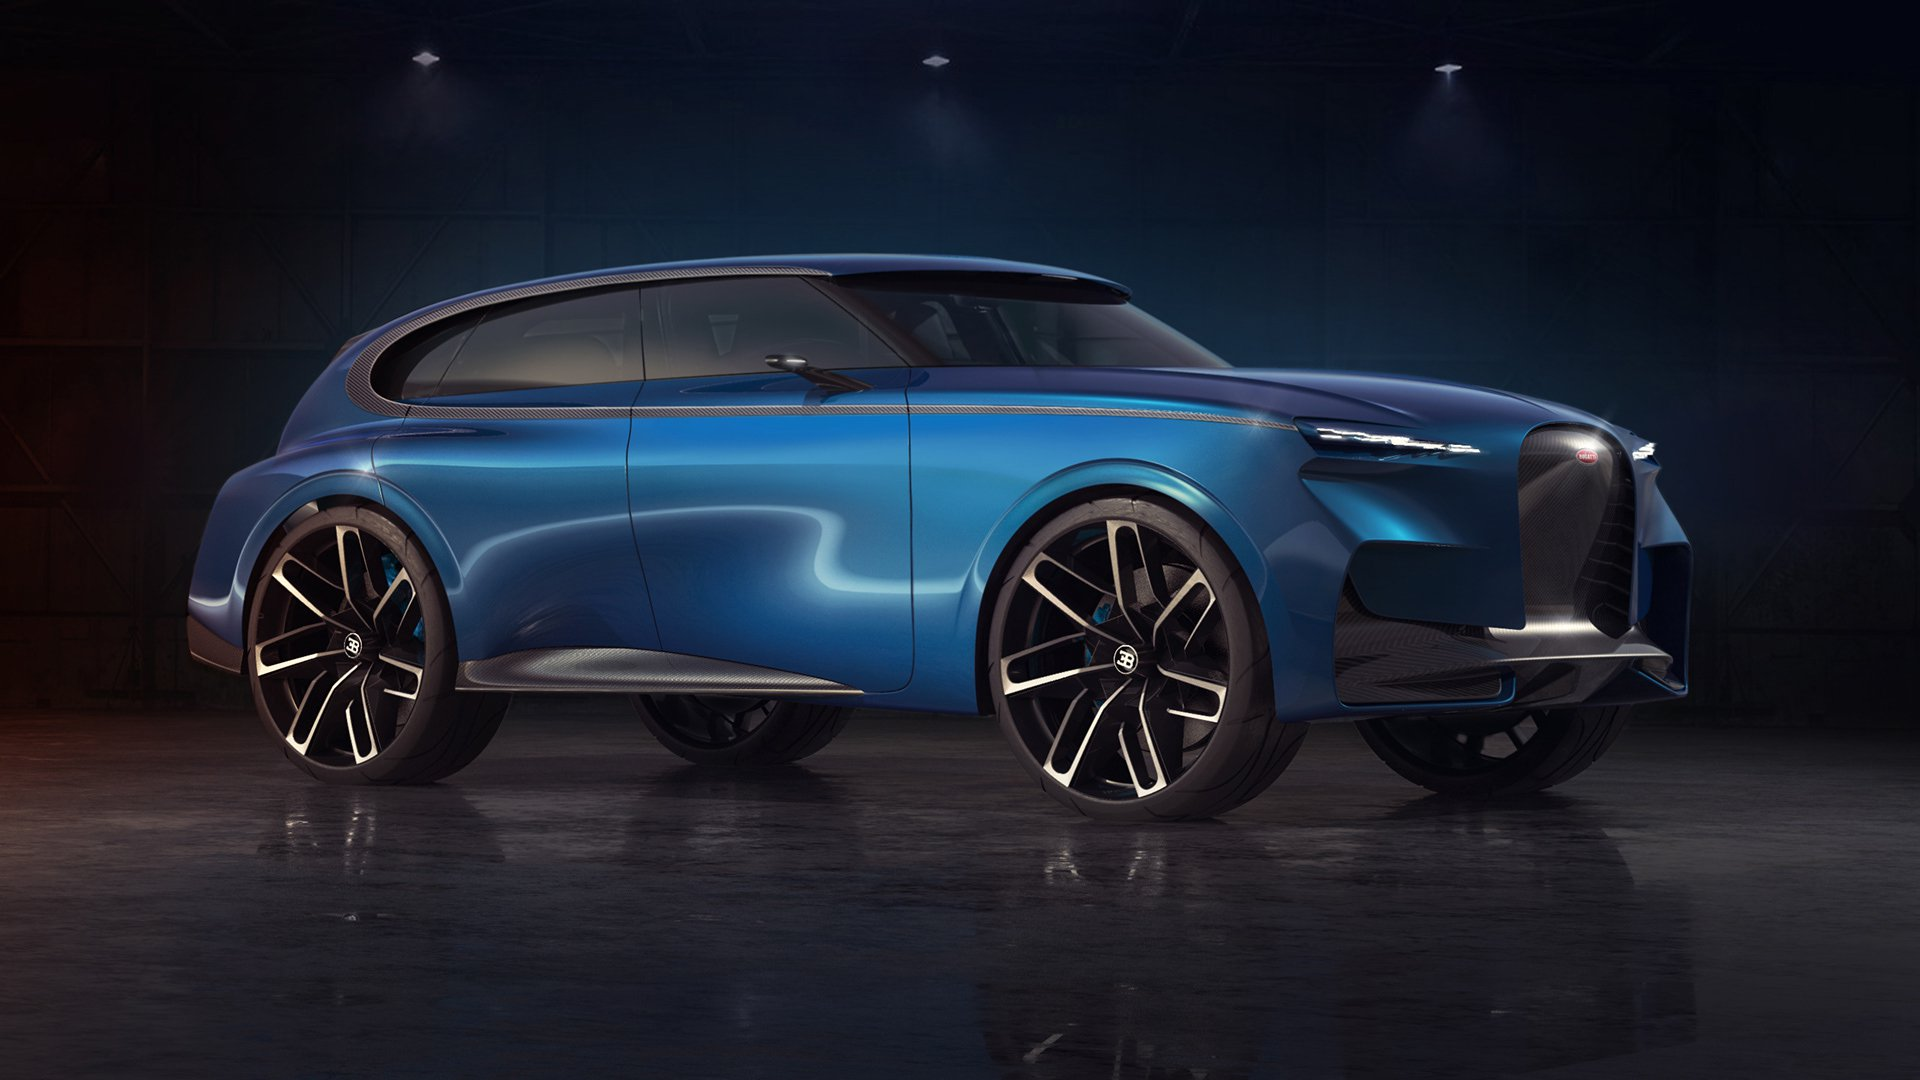 Próxima aposta da Bugatti será um SUV